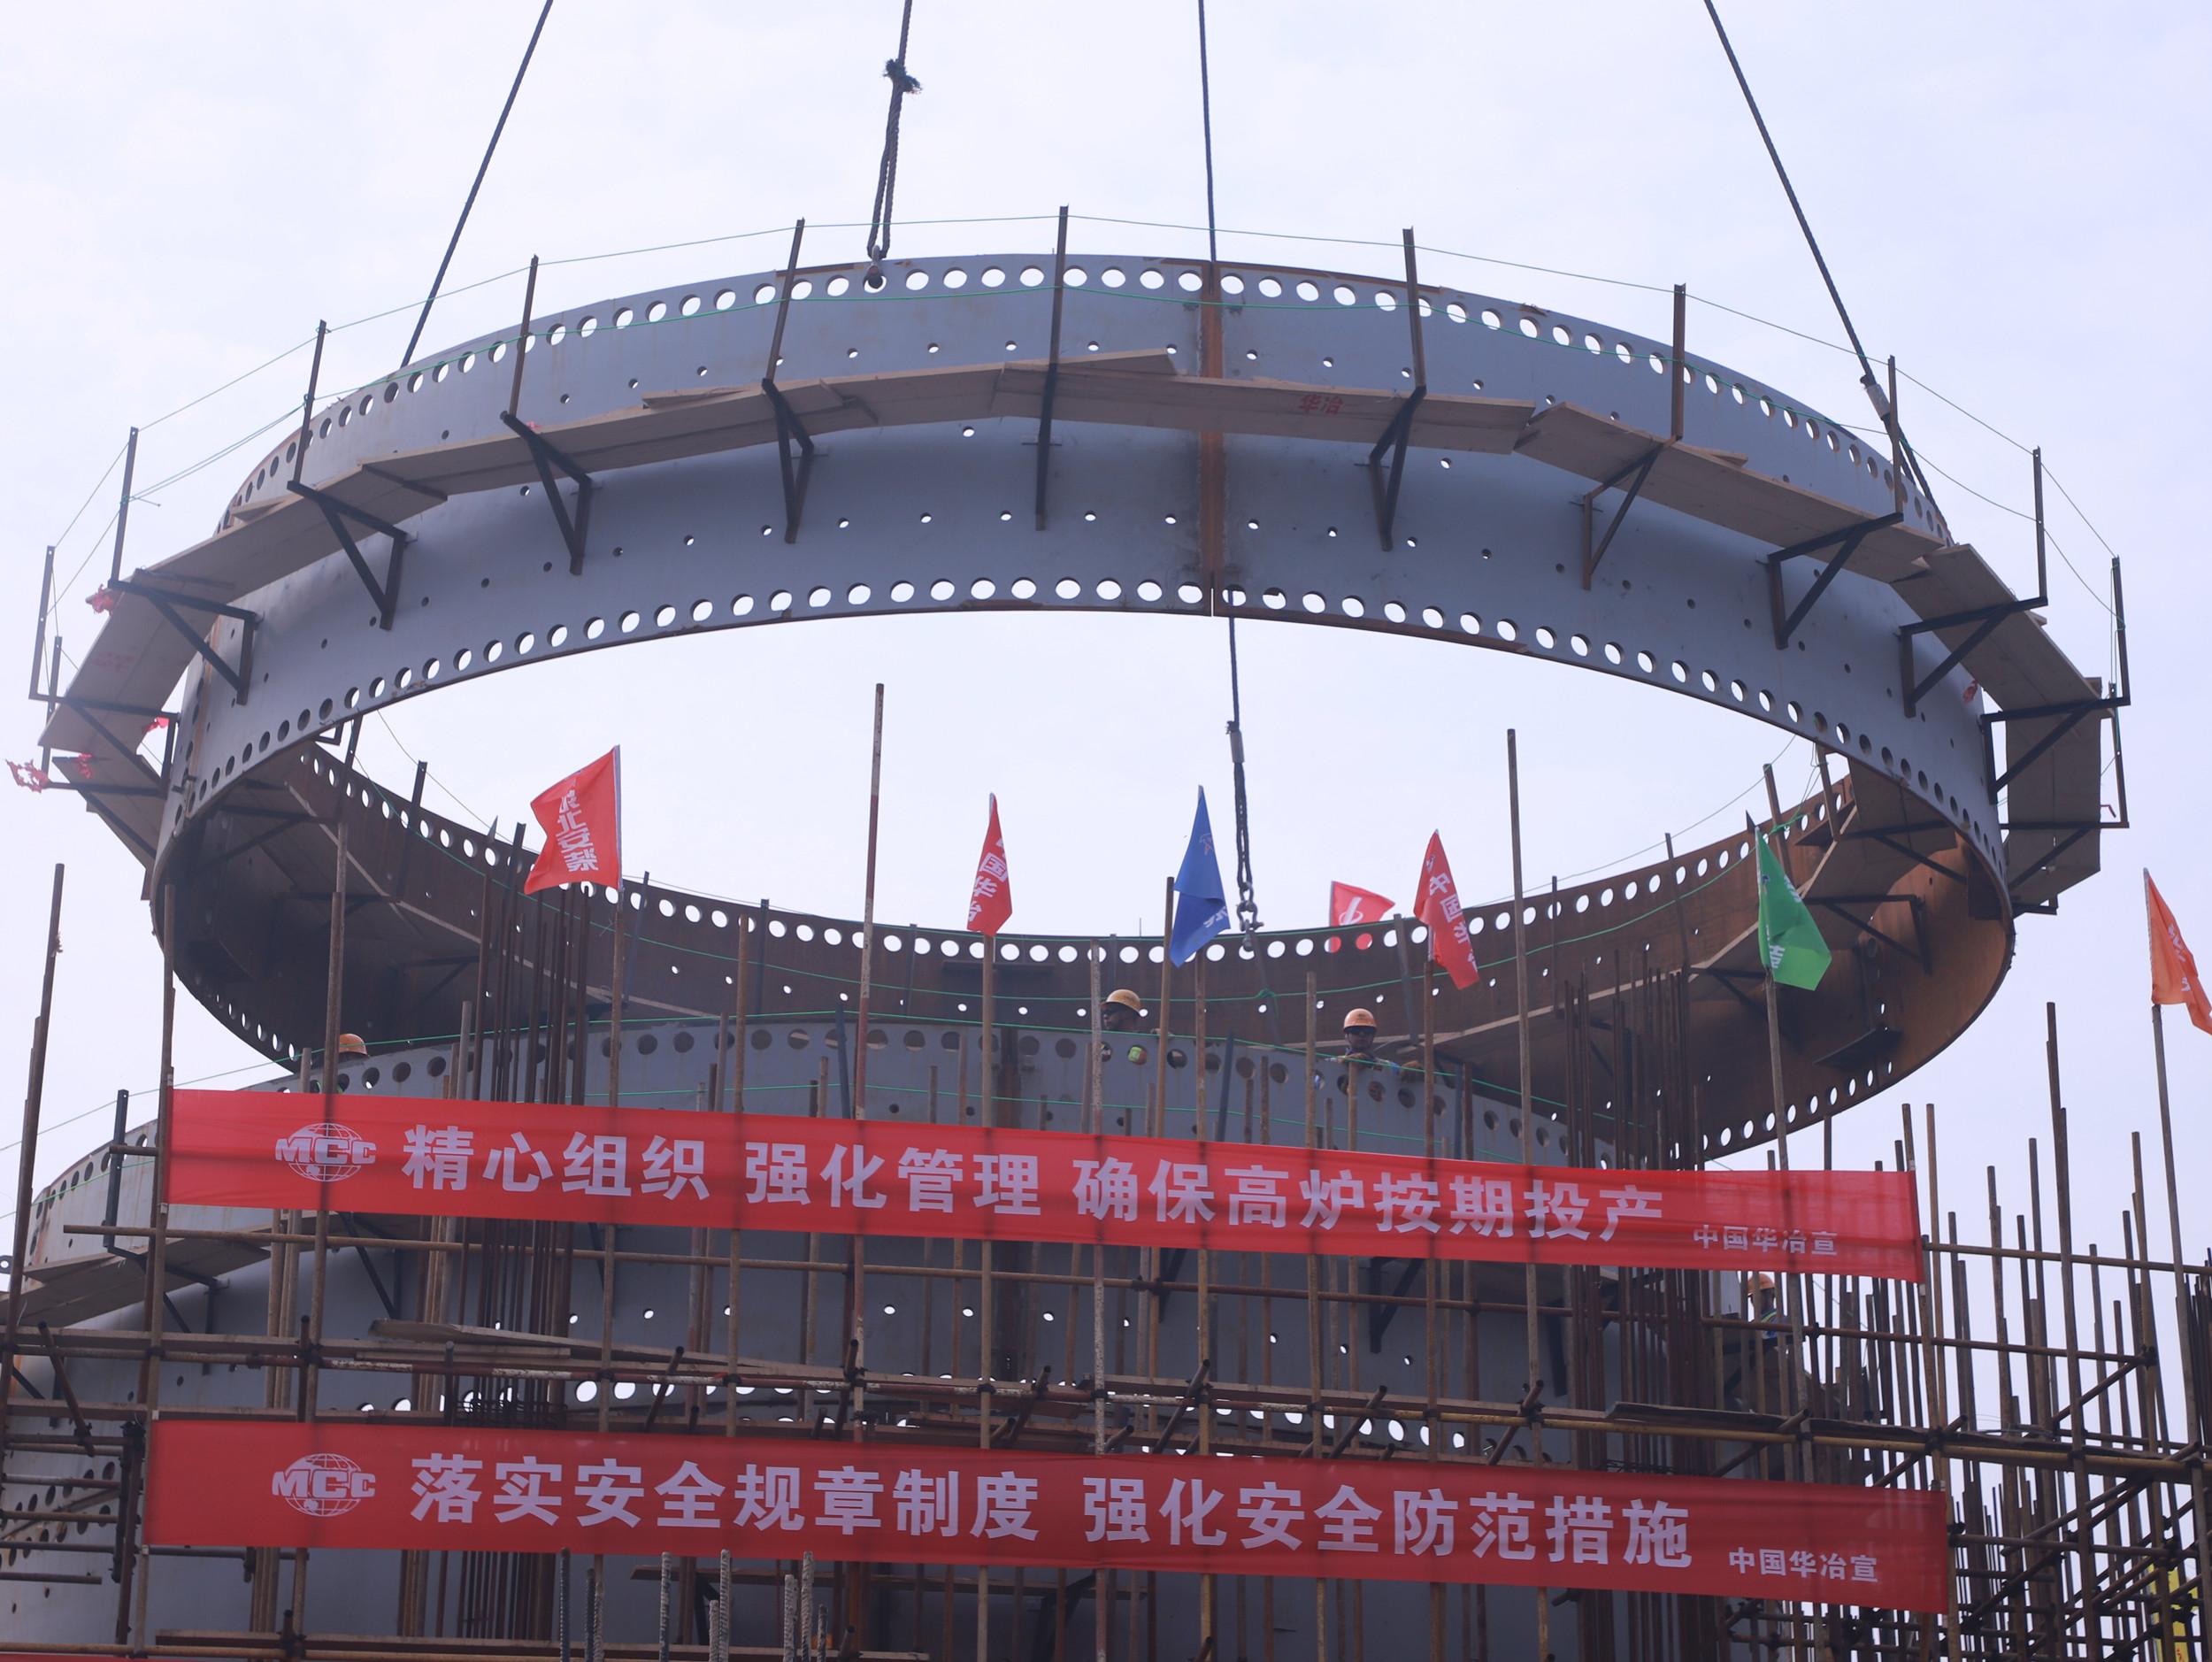 1350m3高炉炉壳吊装仪式暨项目全面推进动员会召开